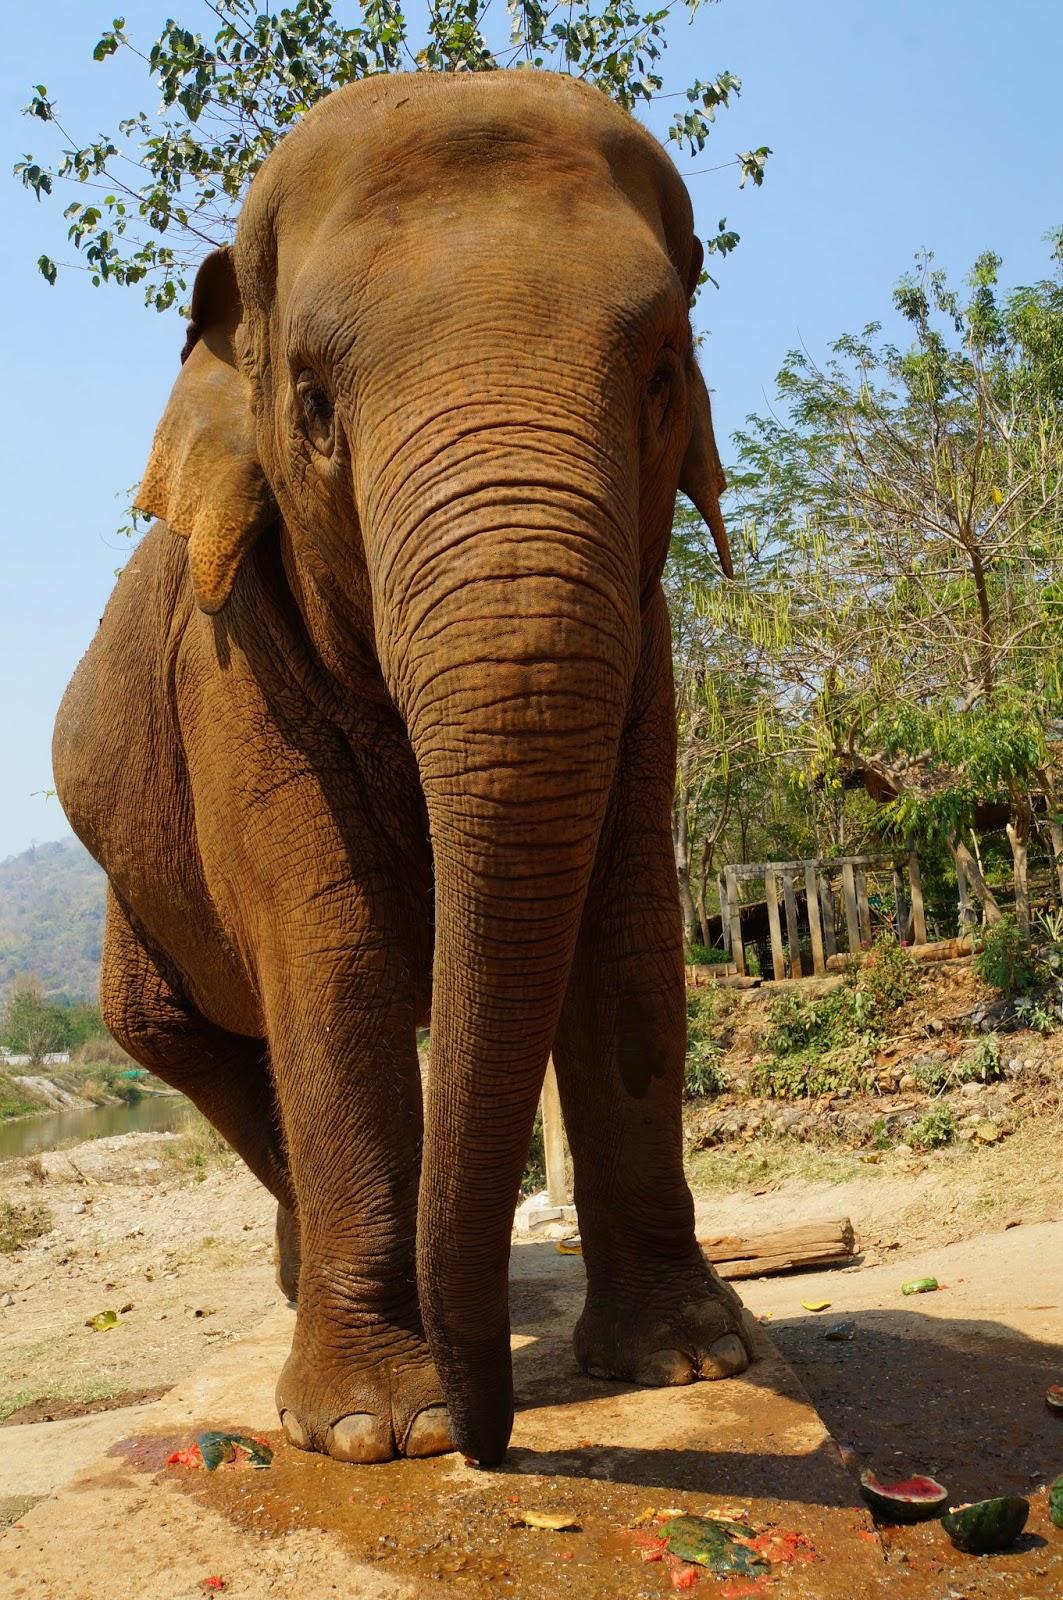 Elephant Eating a Stick Elephants Eat Pretty Much